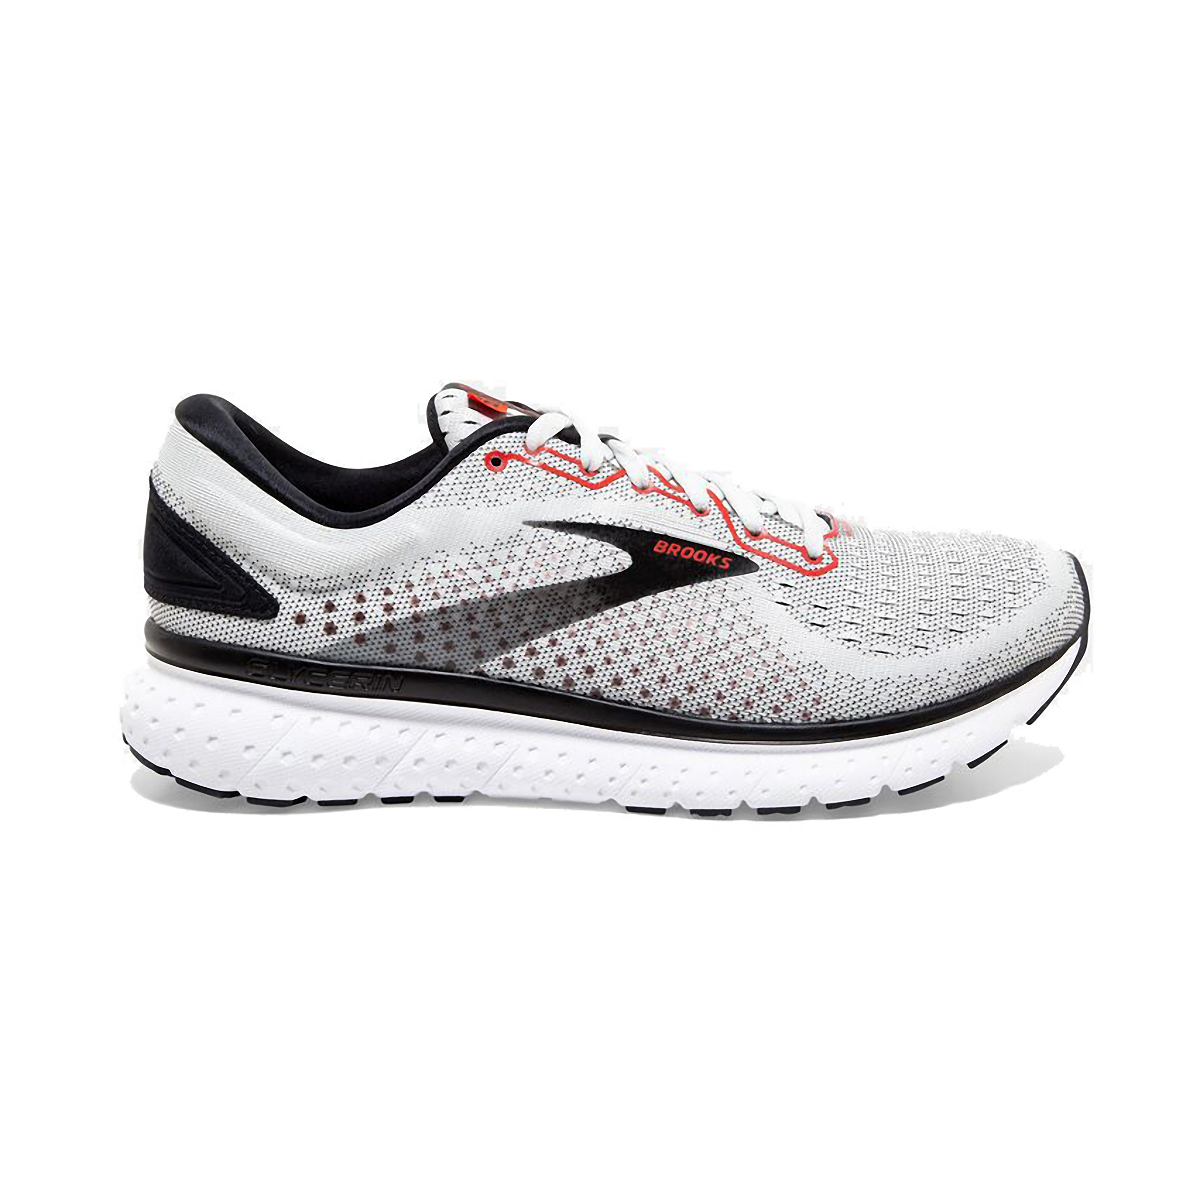 Men's Brooks Glycerin 18 Running Shoe - Color: White/Black/Red - Size: 7 - Width: Regular, White/Black/Red, large, image 1